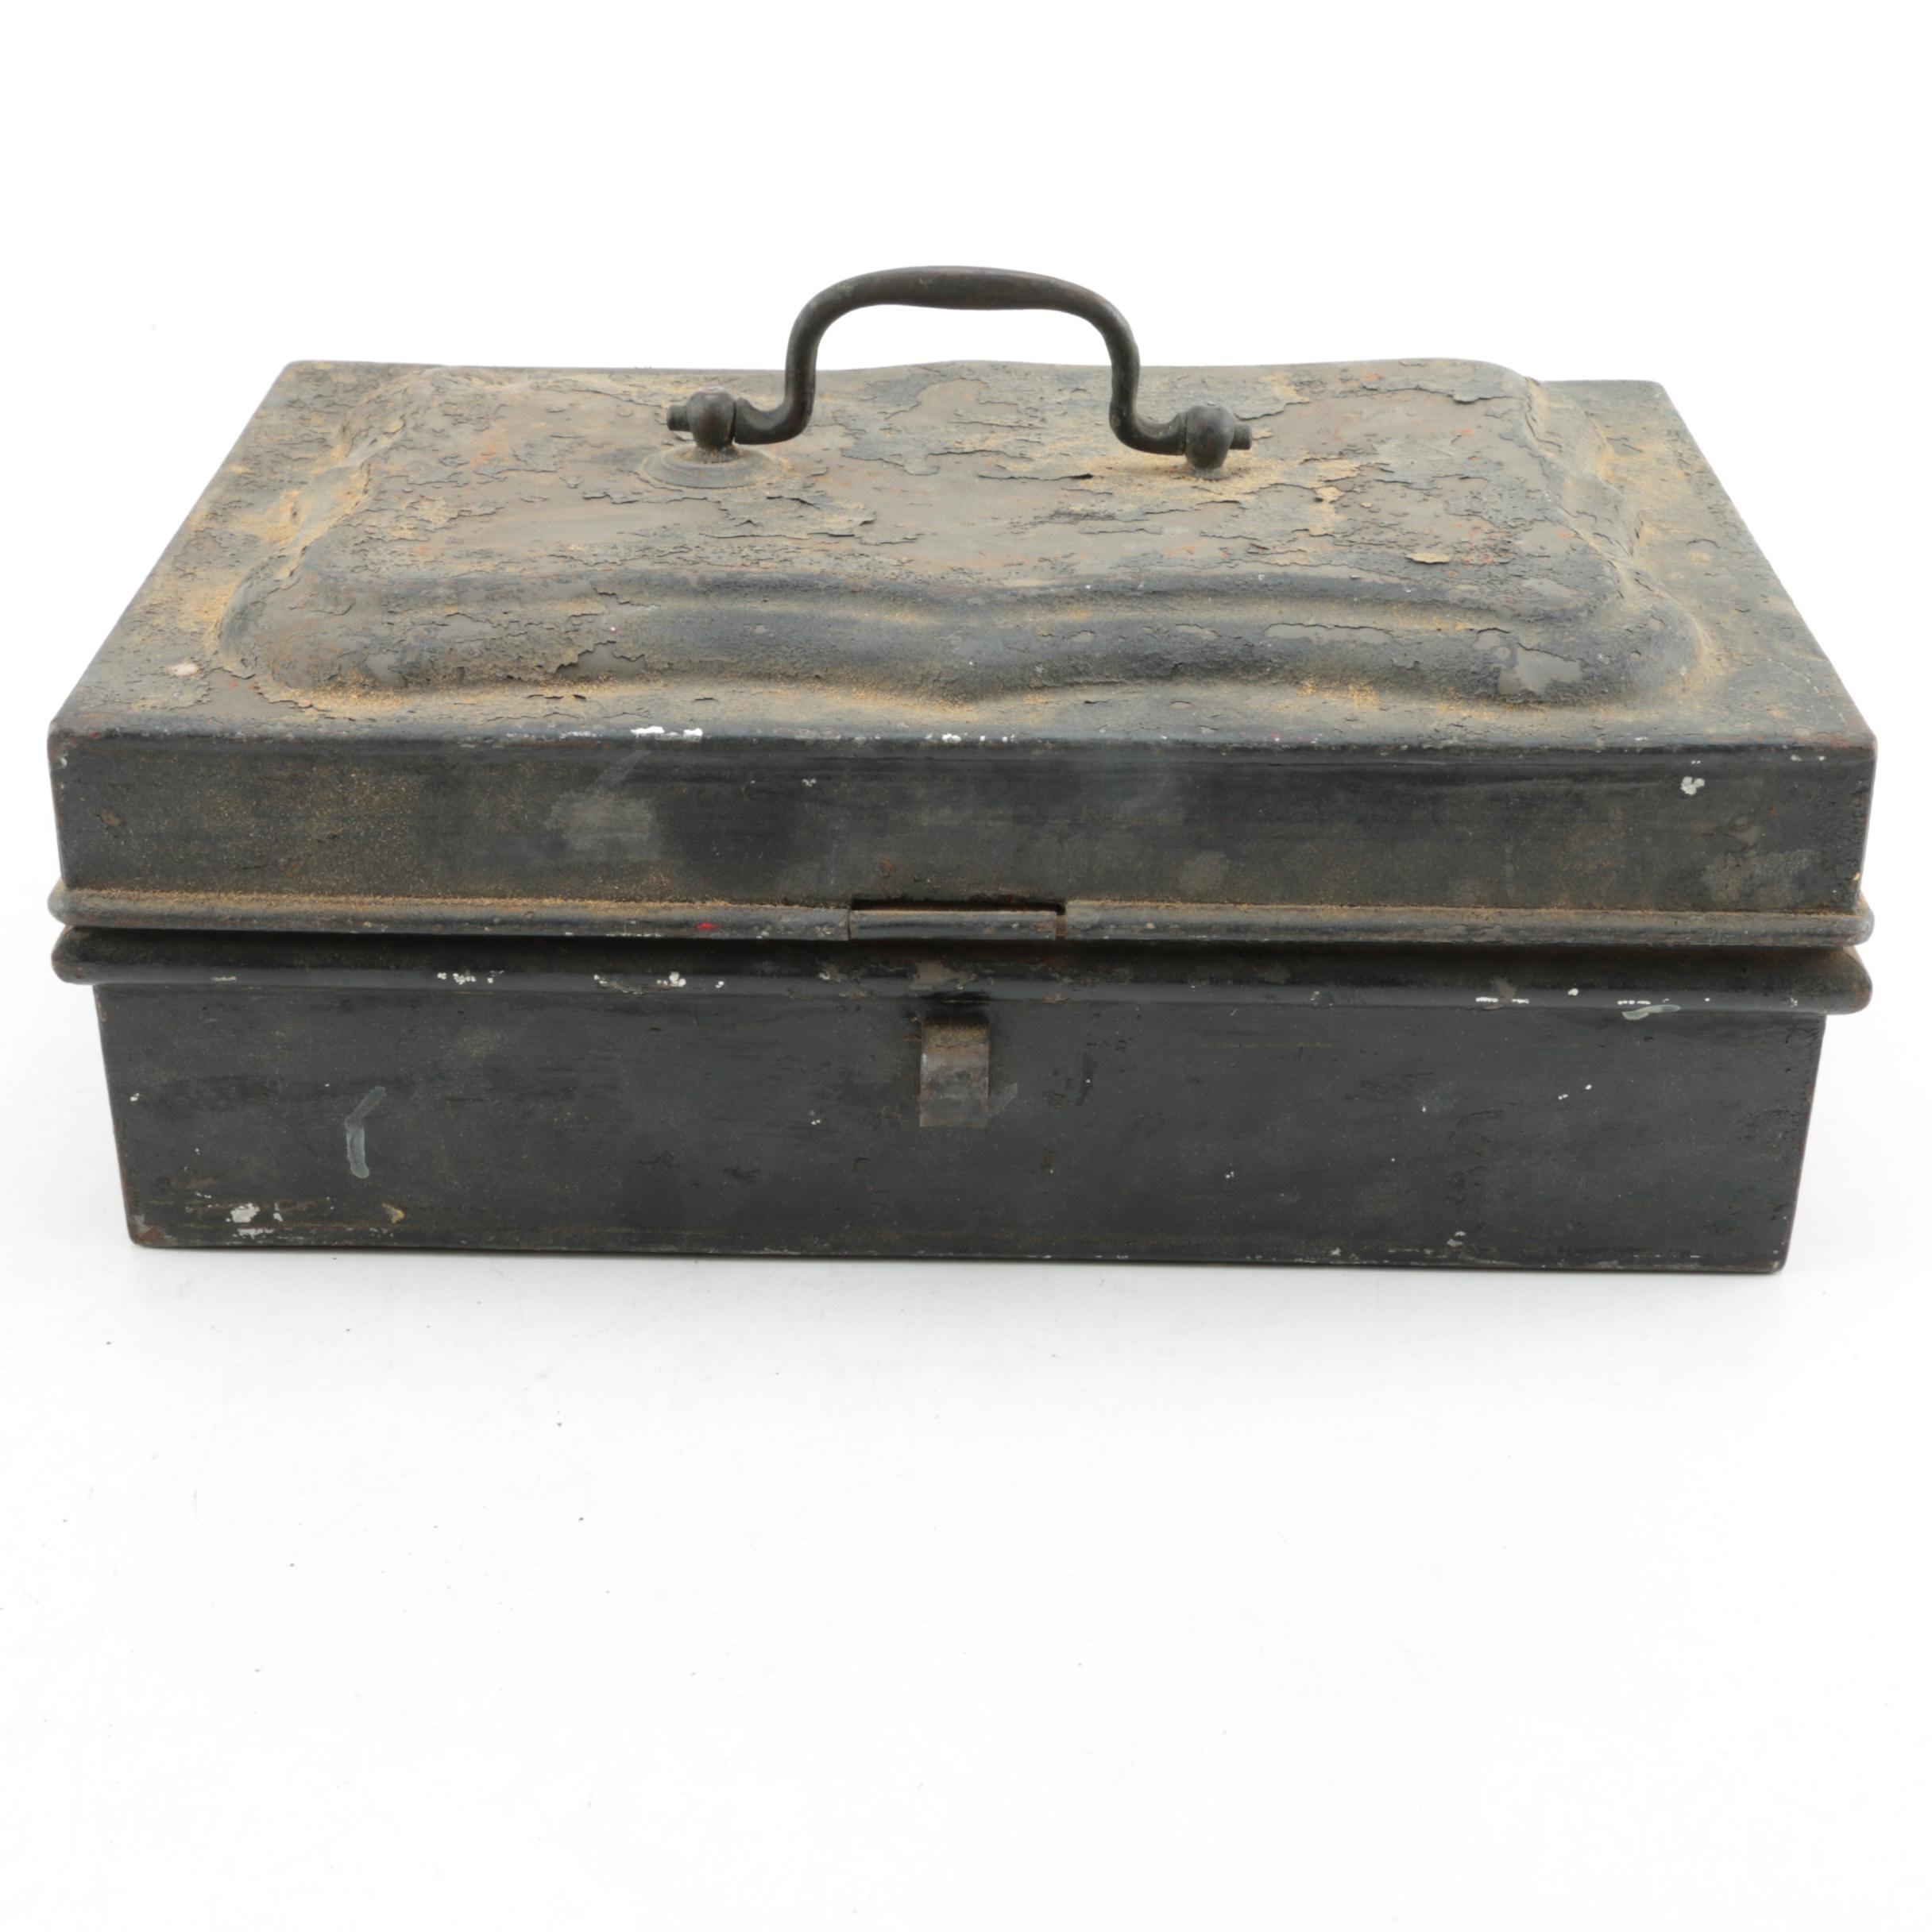 Antique Metal Spice Box with Interior Storage Tins